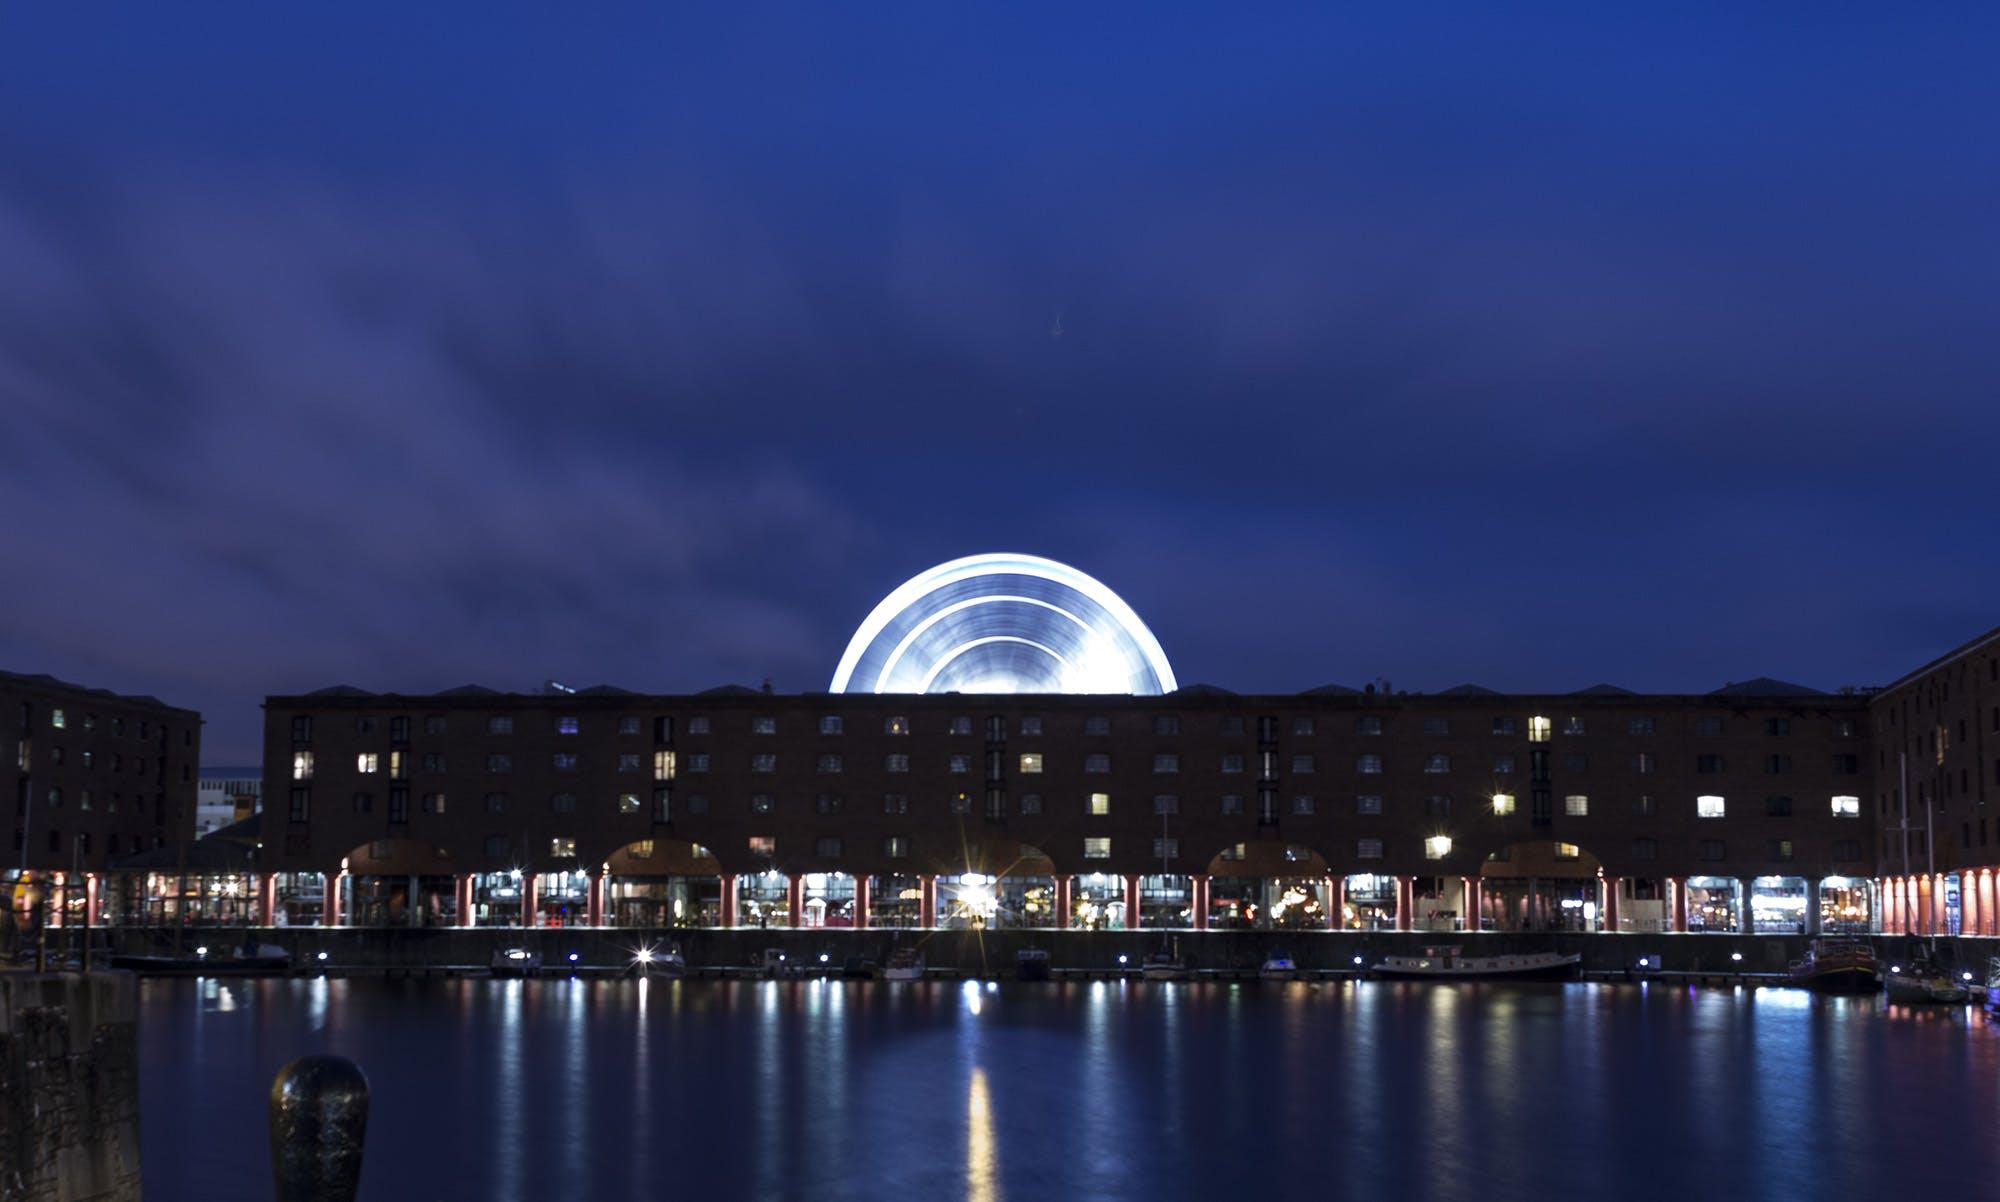 Fotos de stock gratuitas de agua, Albert Dock, amanecer, arquitectura